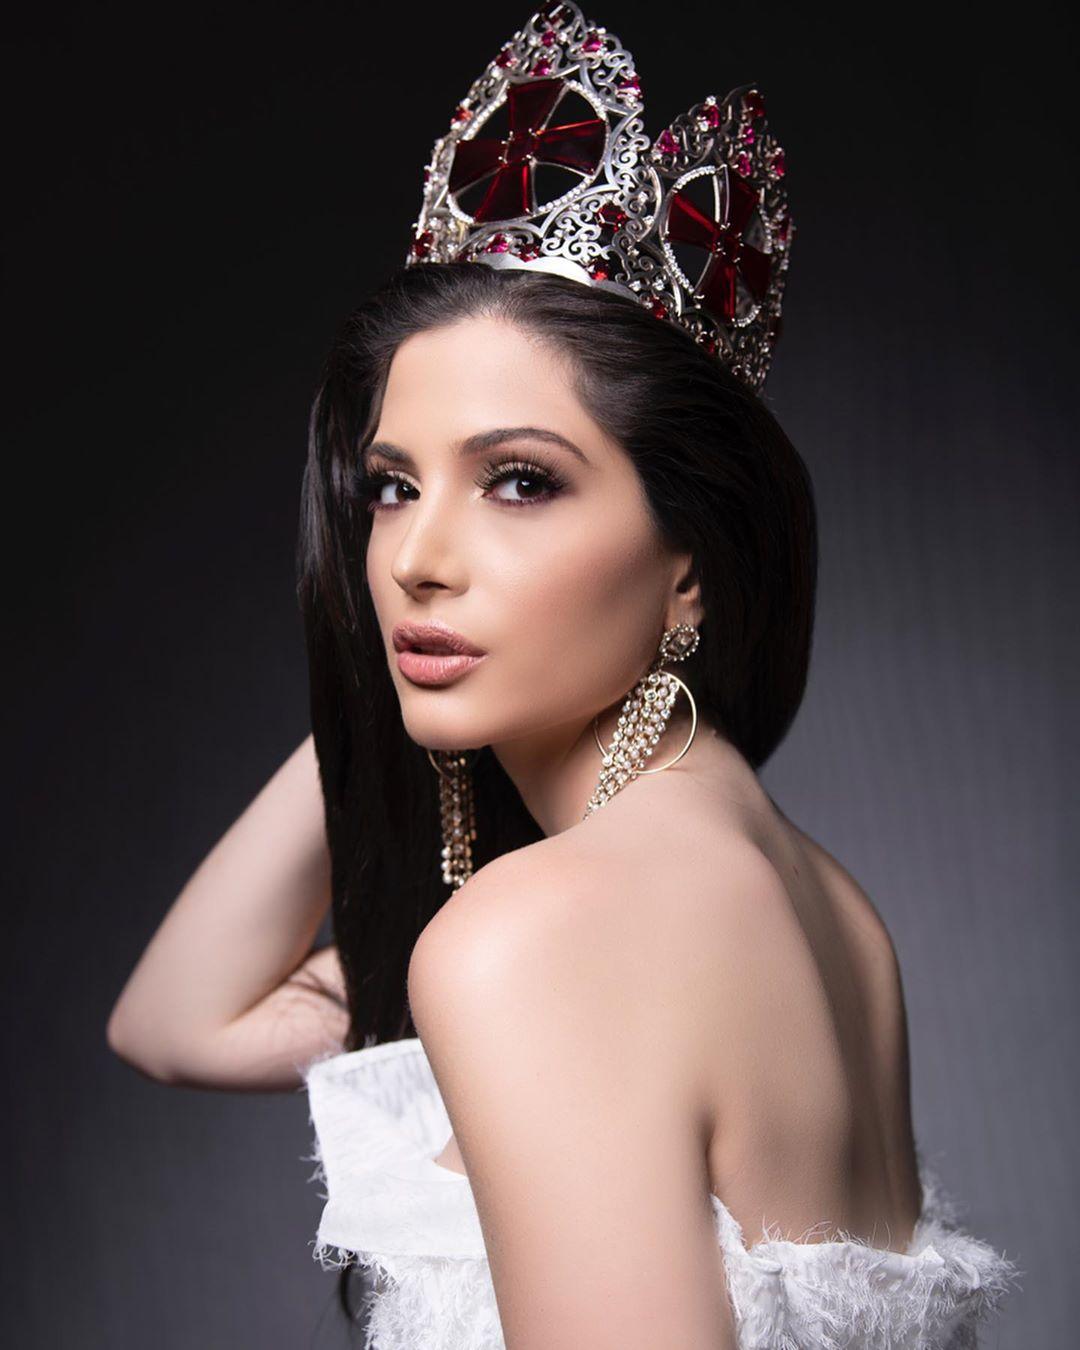 nariman battikha, reyna hispanoamericana 2018/top 10 de miss supranational 2018. - Página 12 83154510